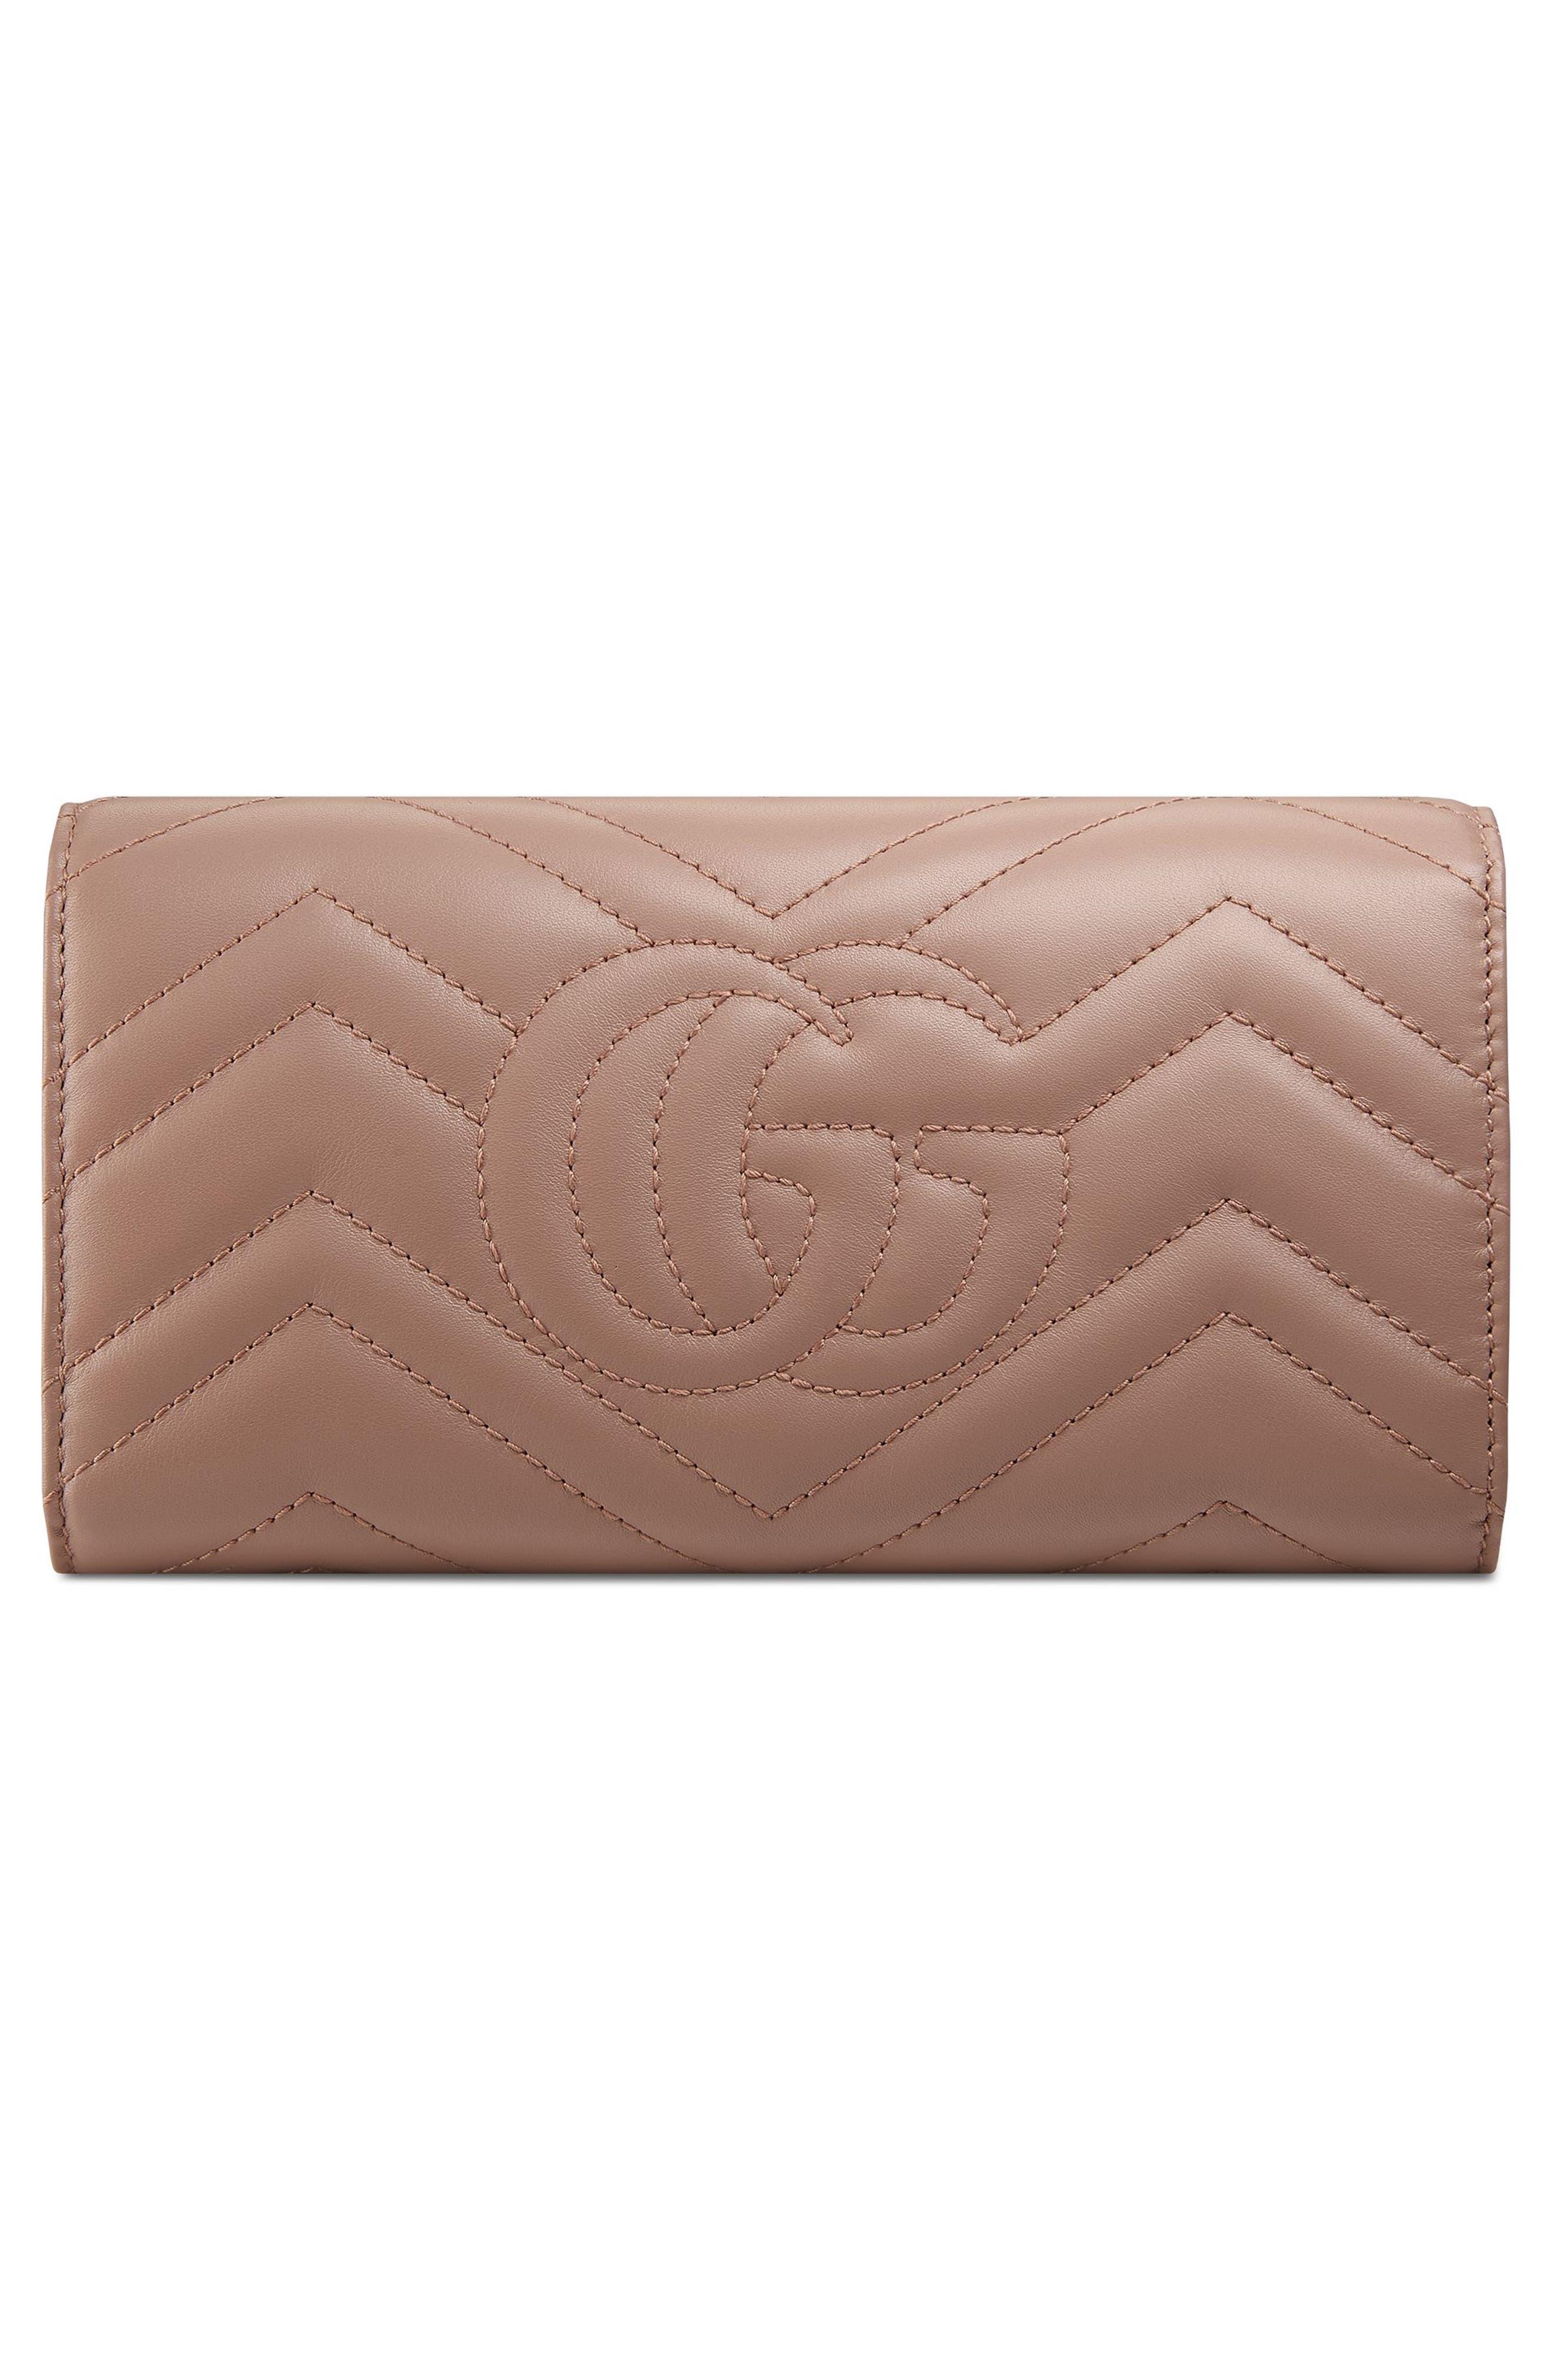 Alternate Image 3  - Gucci GG Marmont Matelassé Leather Continental Wallet